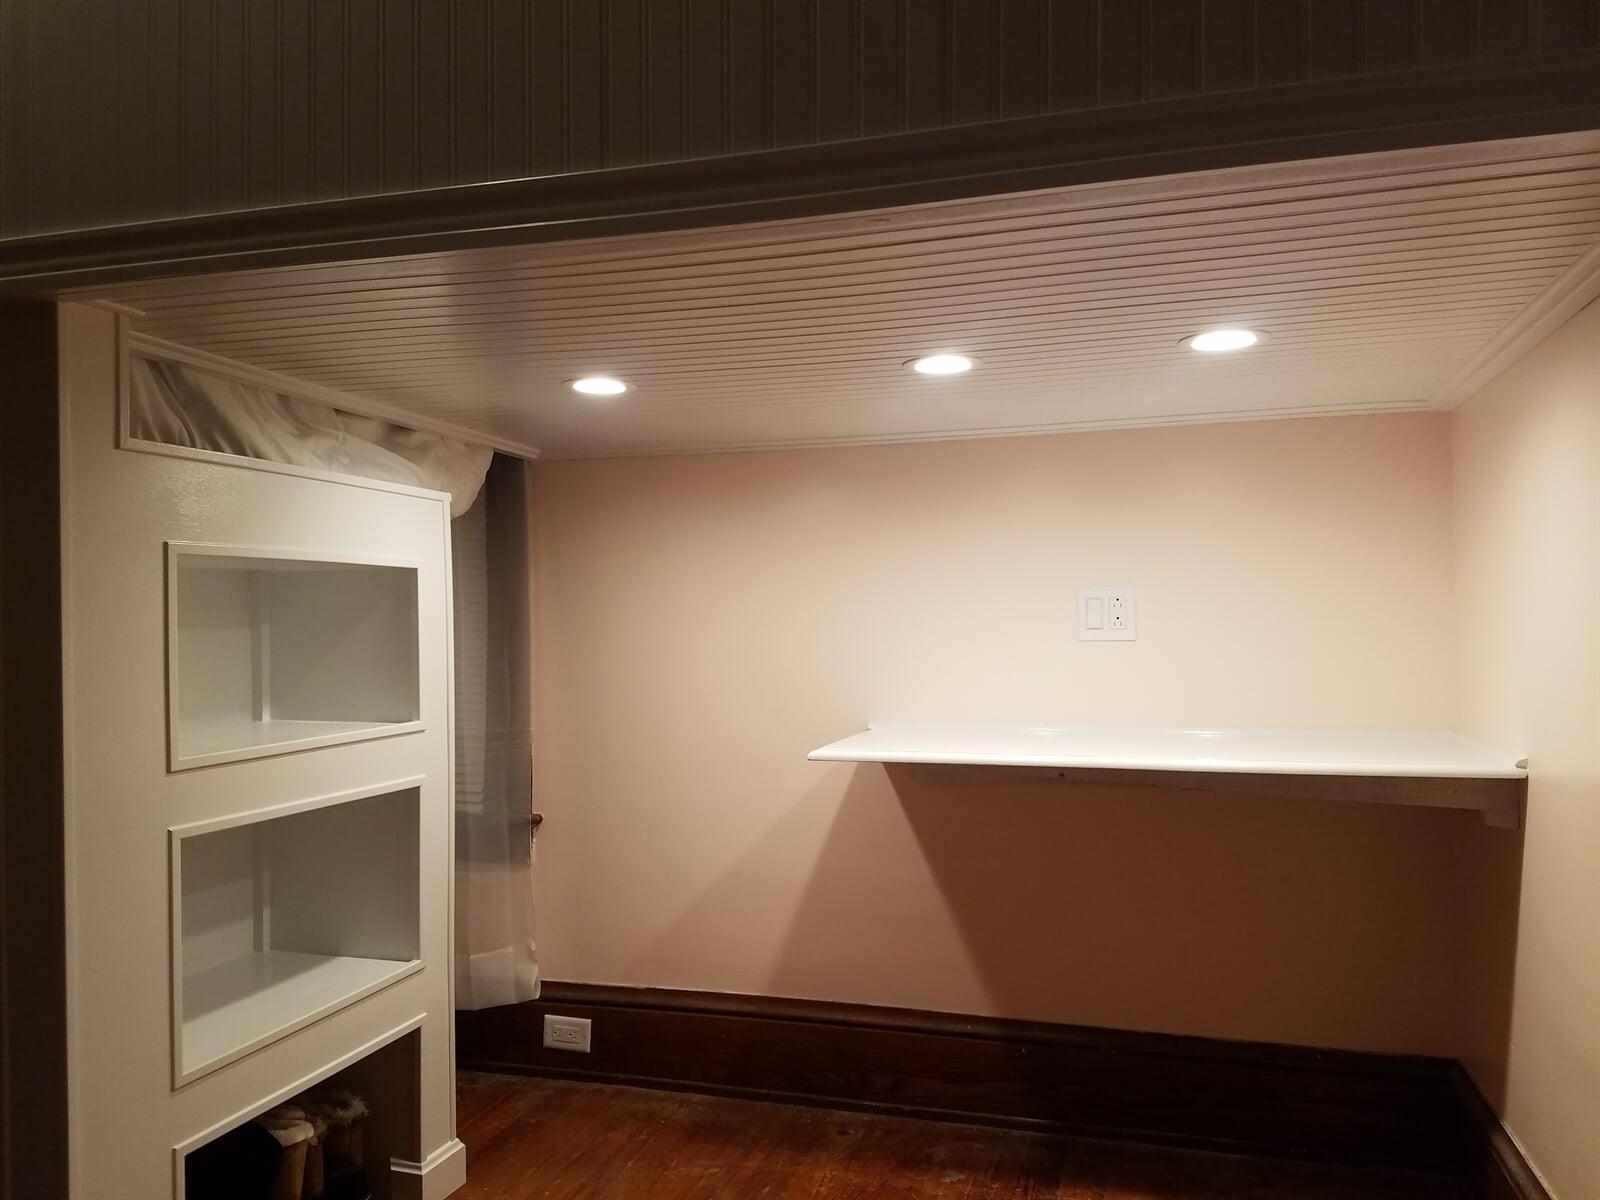 Custom built Desk and Office Area in Basement